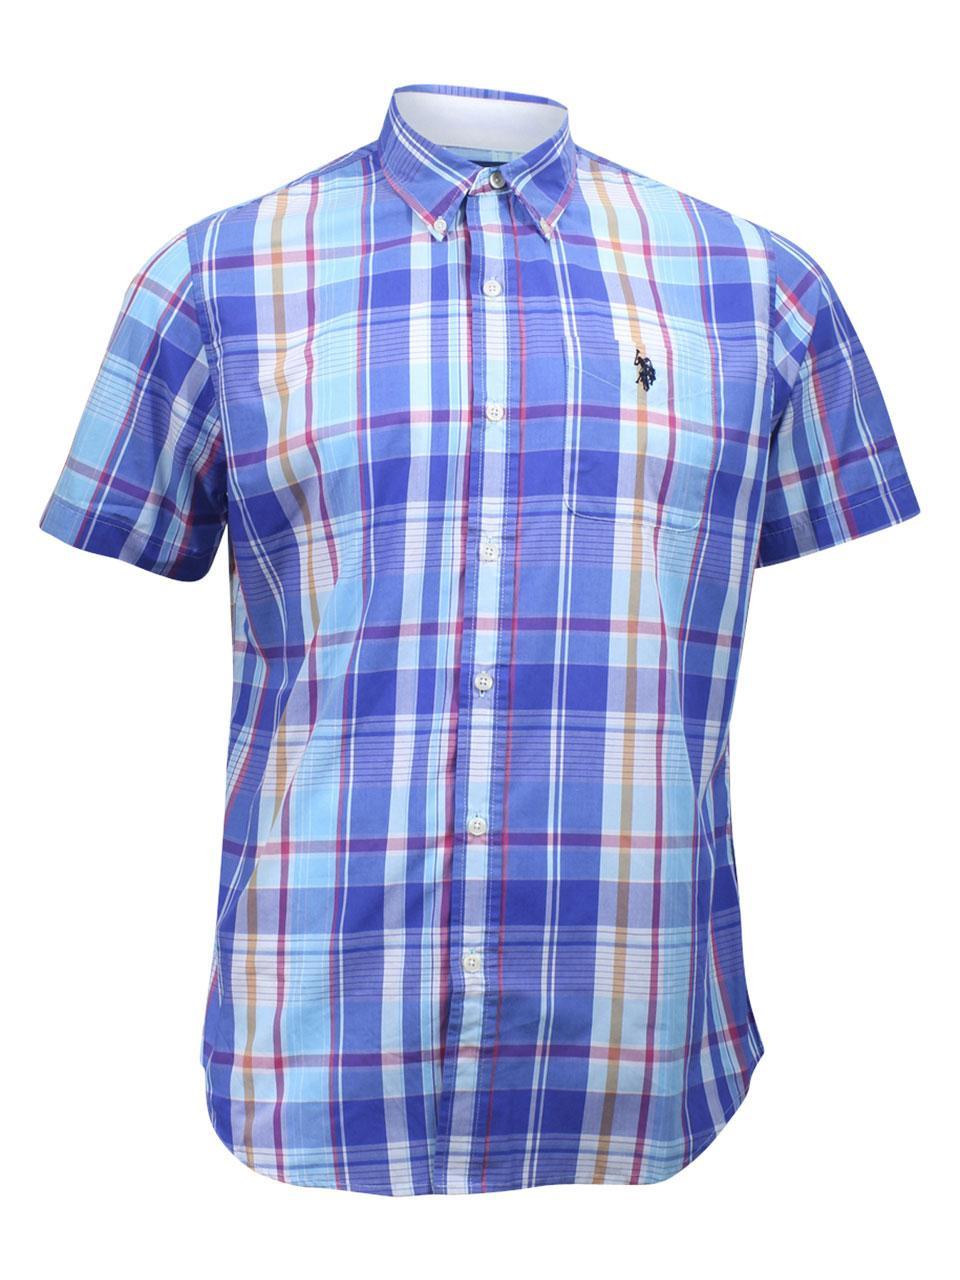 cba94755f16 U.S. Polo Association Men's Plaid Short Sleeve Button Down Shirt